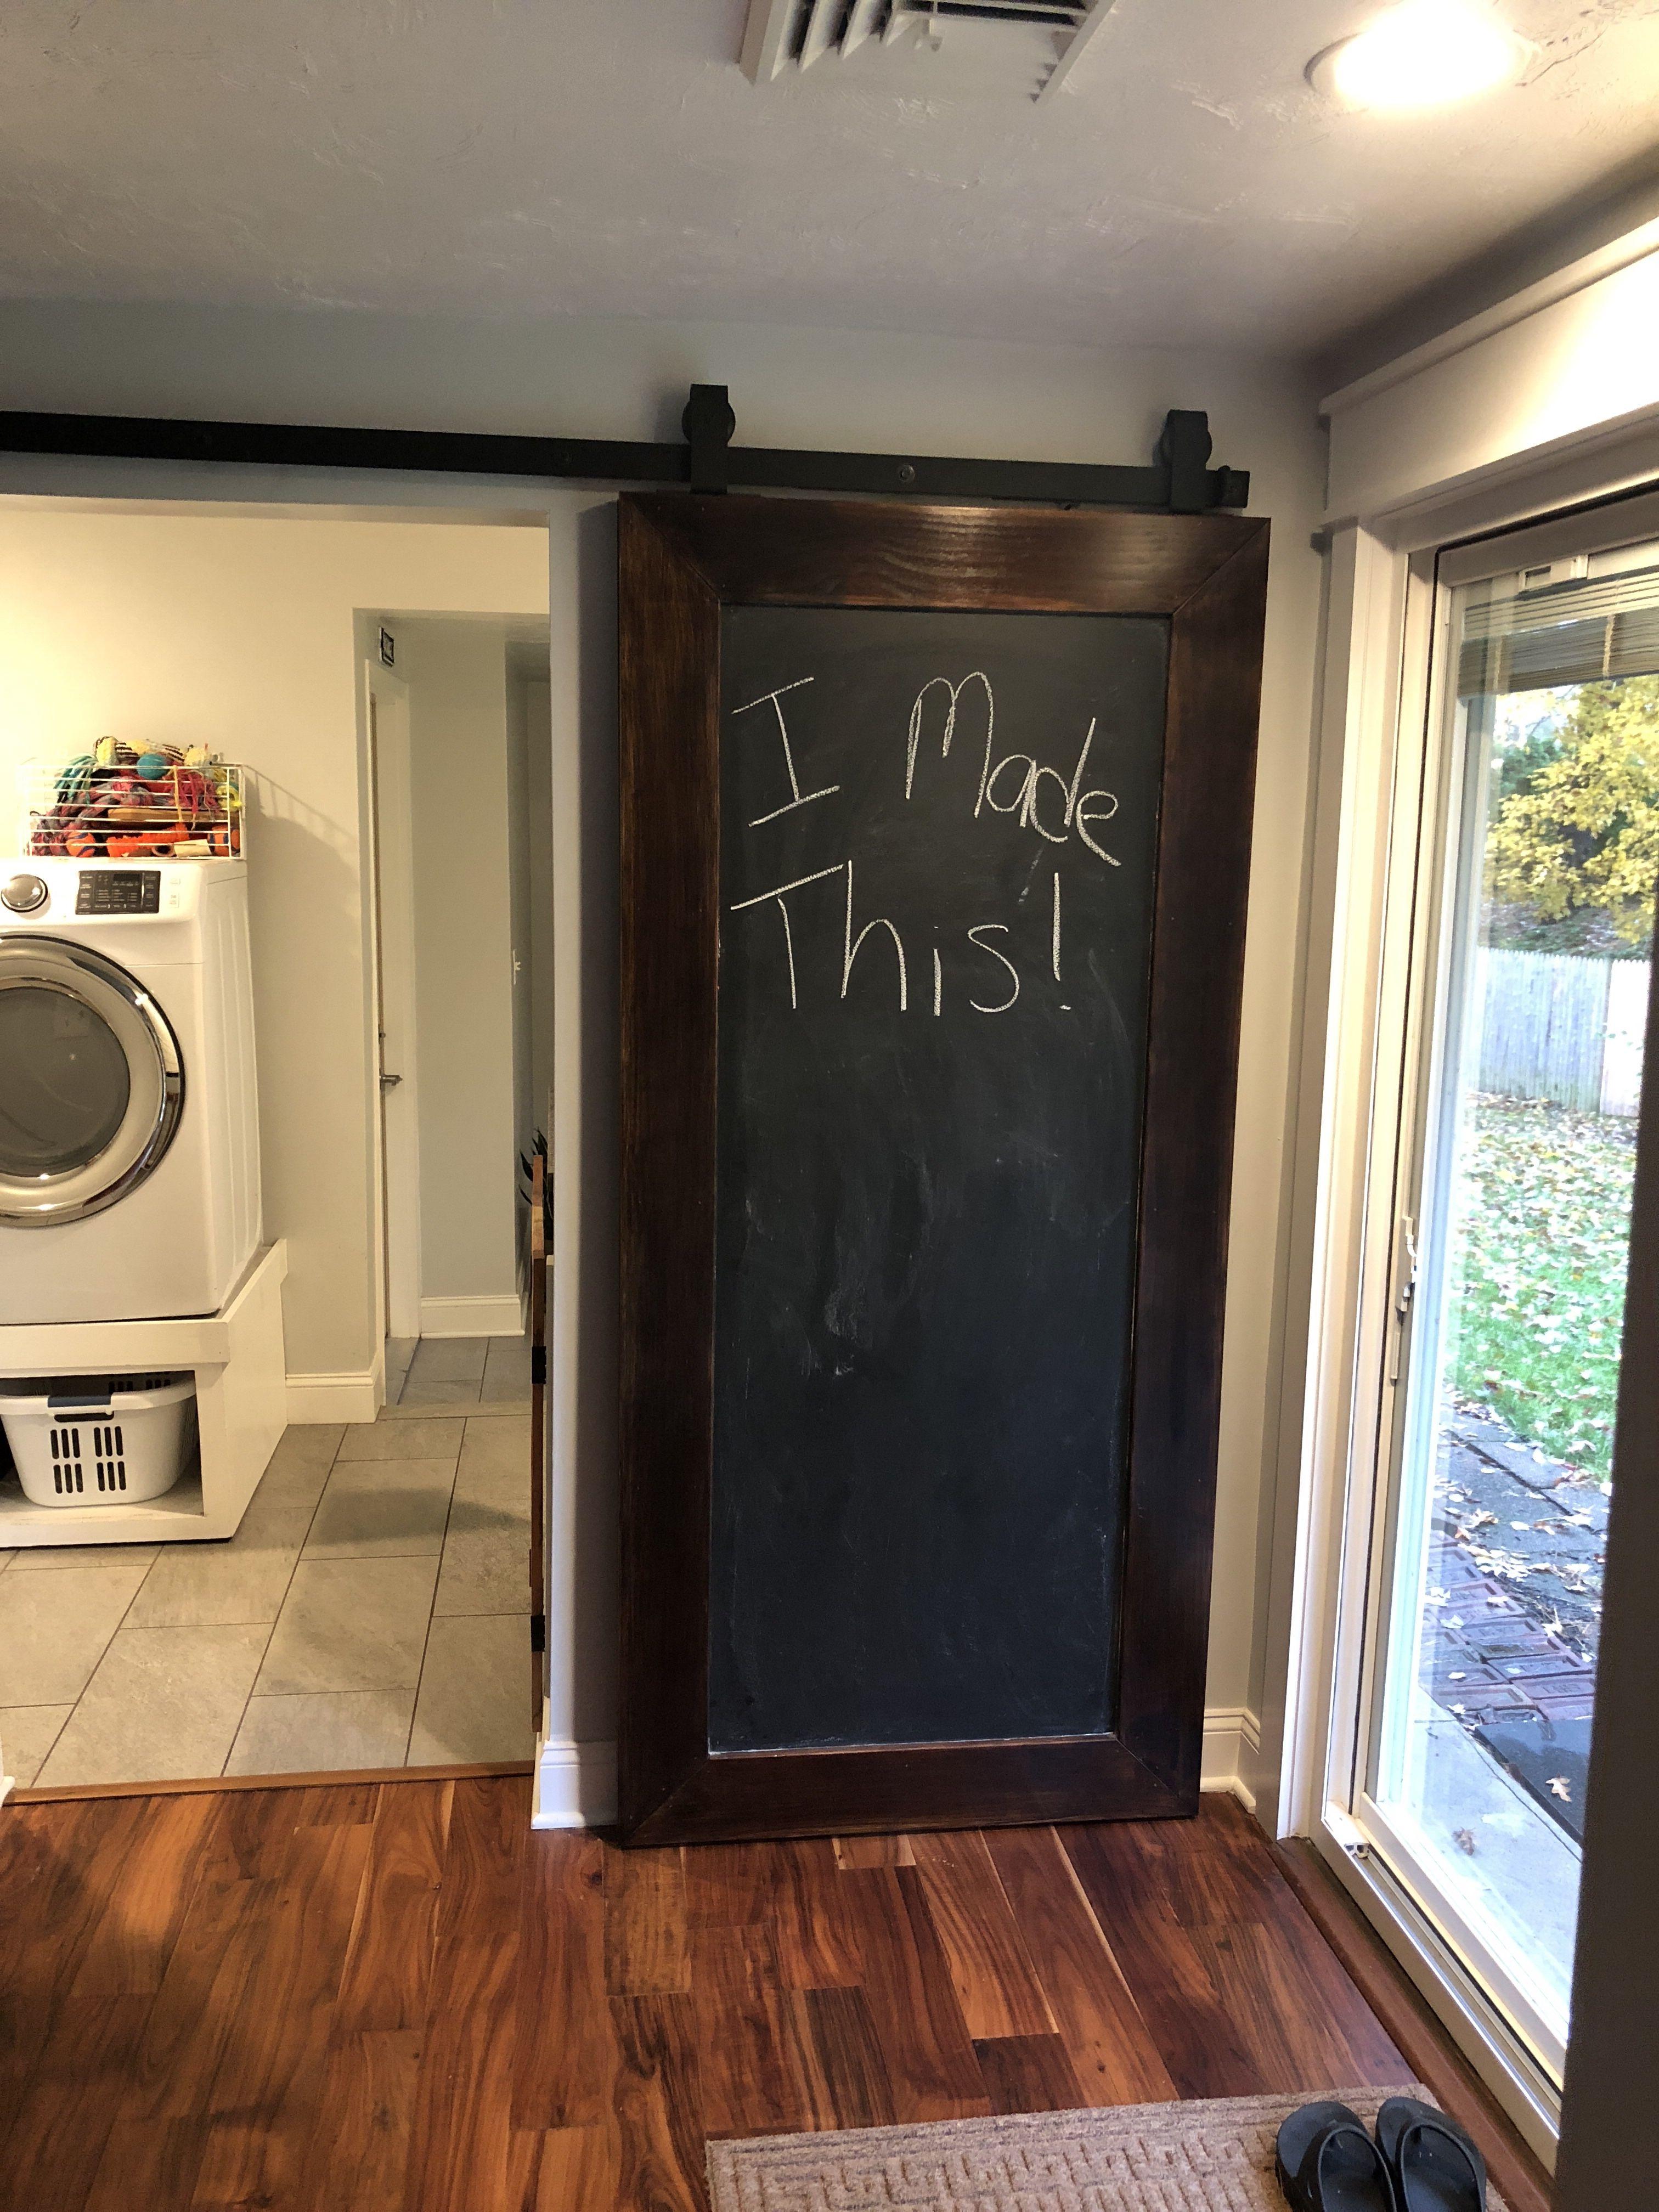 Diy Chalkboard Barn Door From Painted Hollow Core Door Barn Door Hollow Core Doors Diy Chalkboard